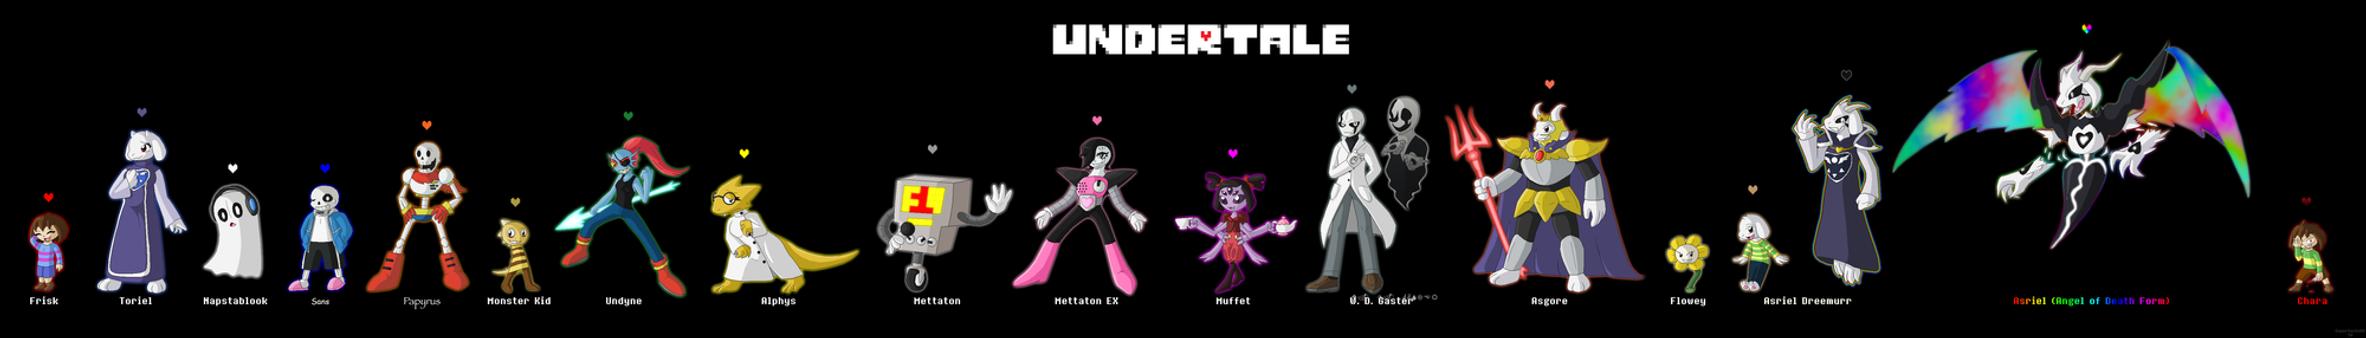 Undertale Doodles (SPOILERS) by SuperSonicGX